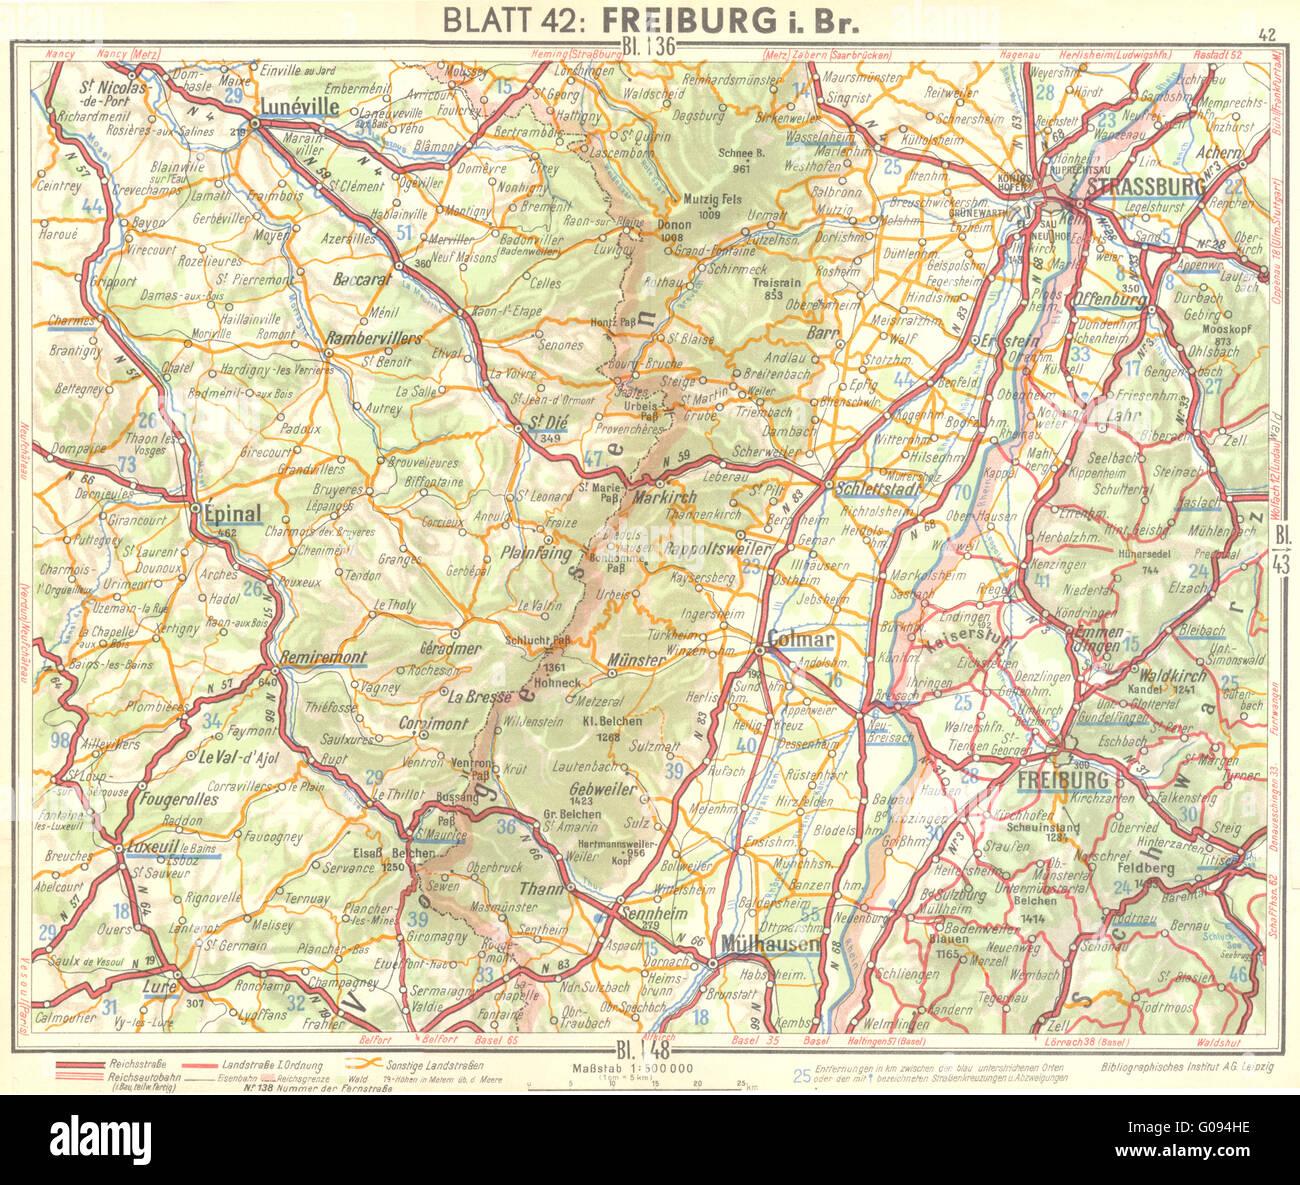 Freiburg Karte.Deutschland Karte Freiburg I Br Jahrgang 1936 Stockfoto